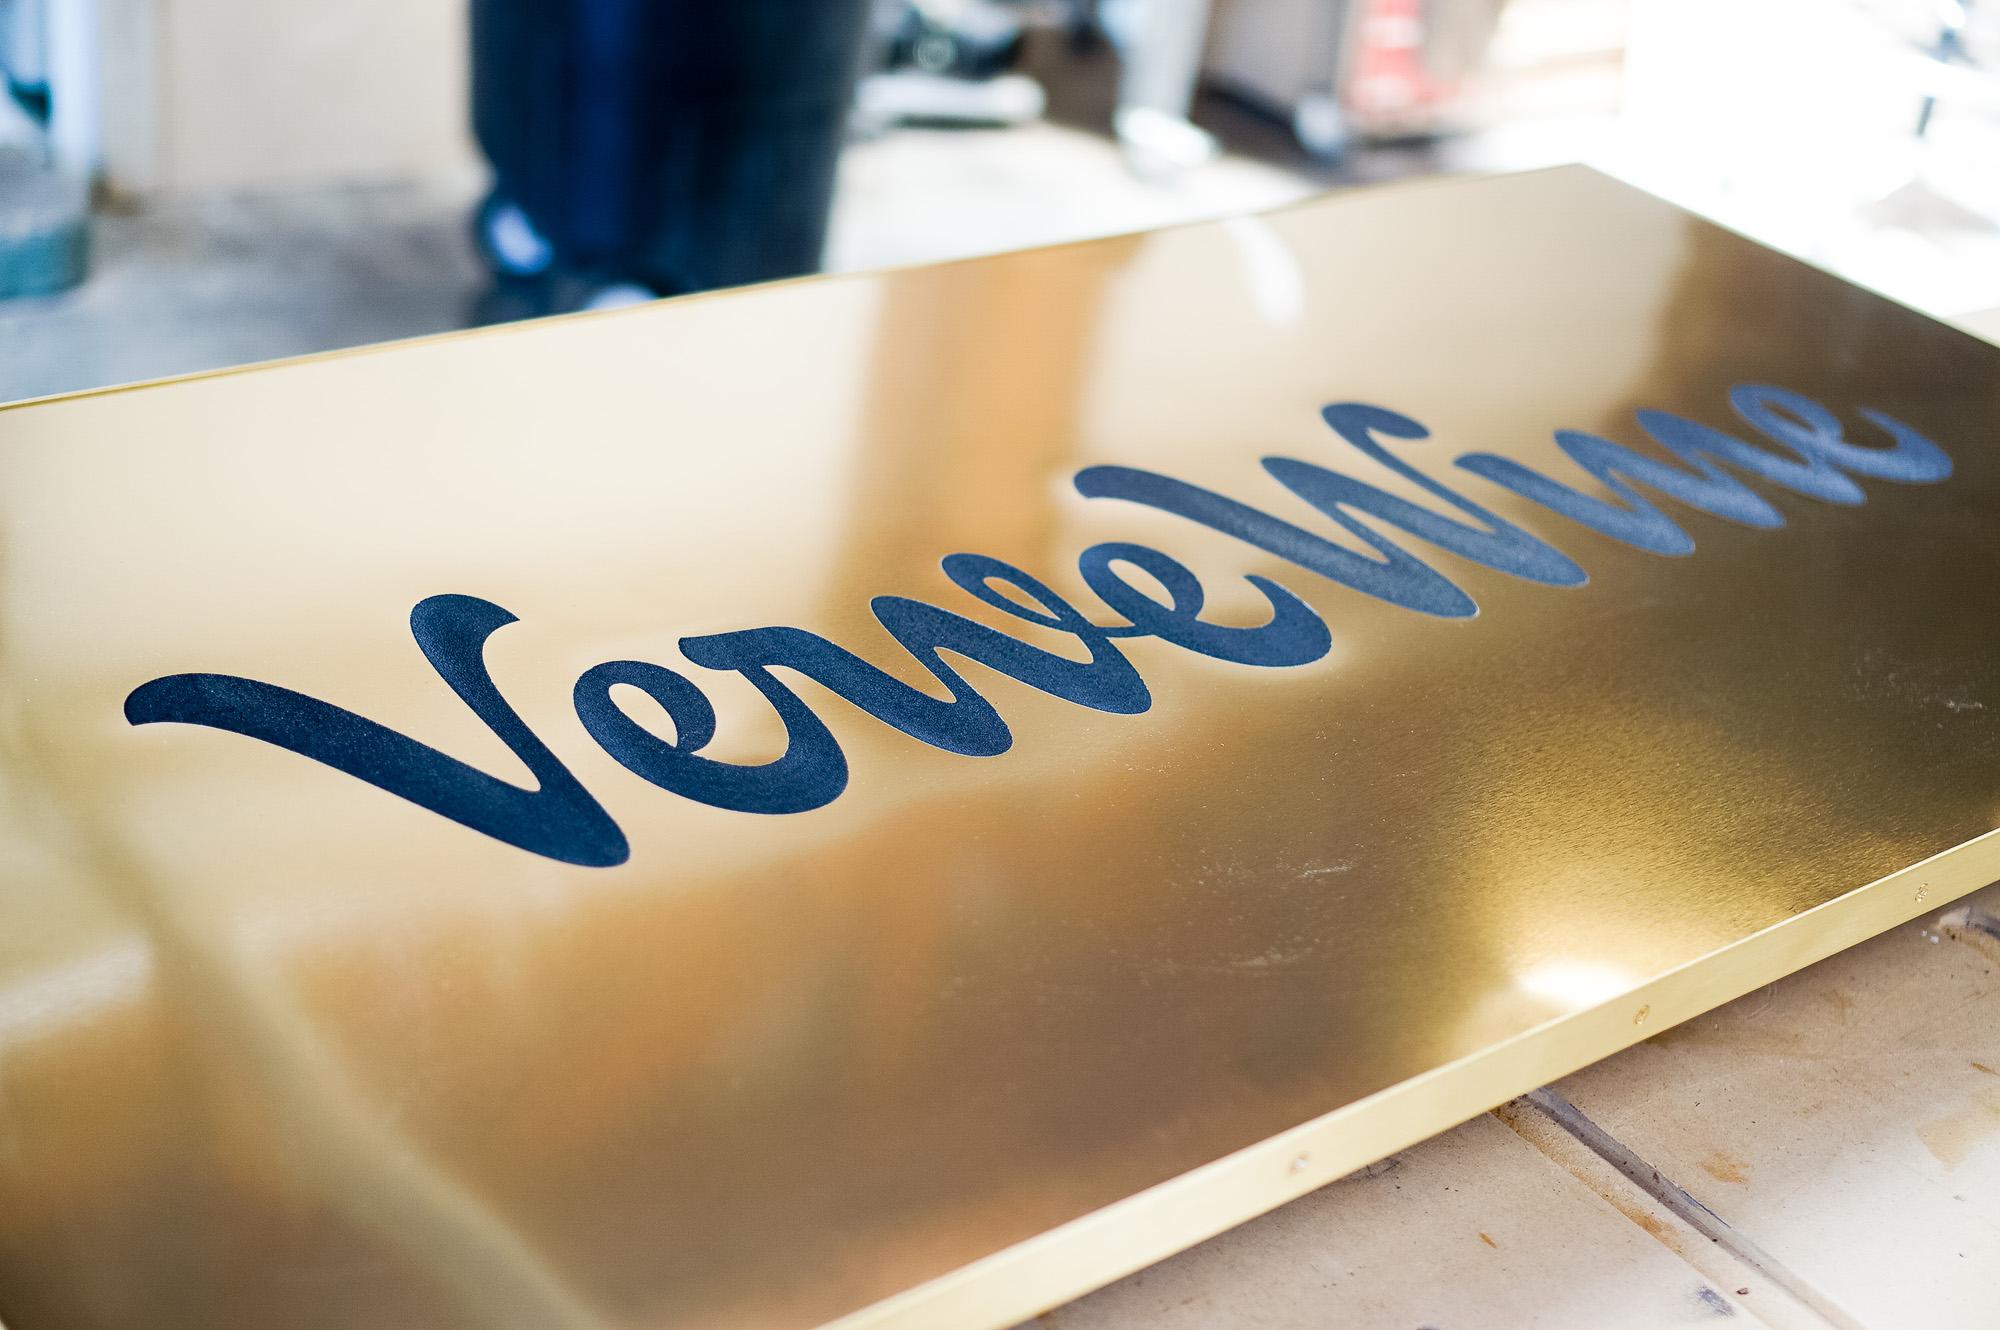 Verve Wine Copper Brass Bronze Modern Retail Hanging Blade Sign with script